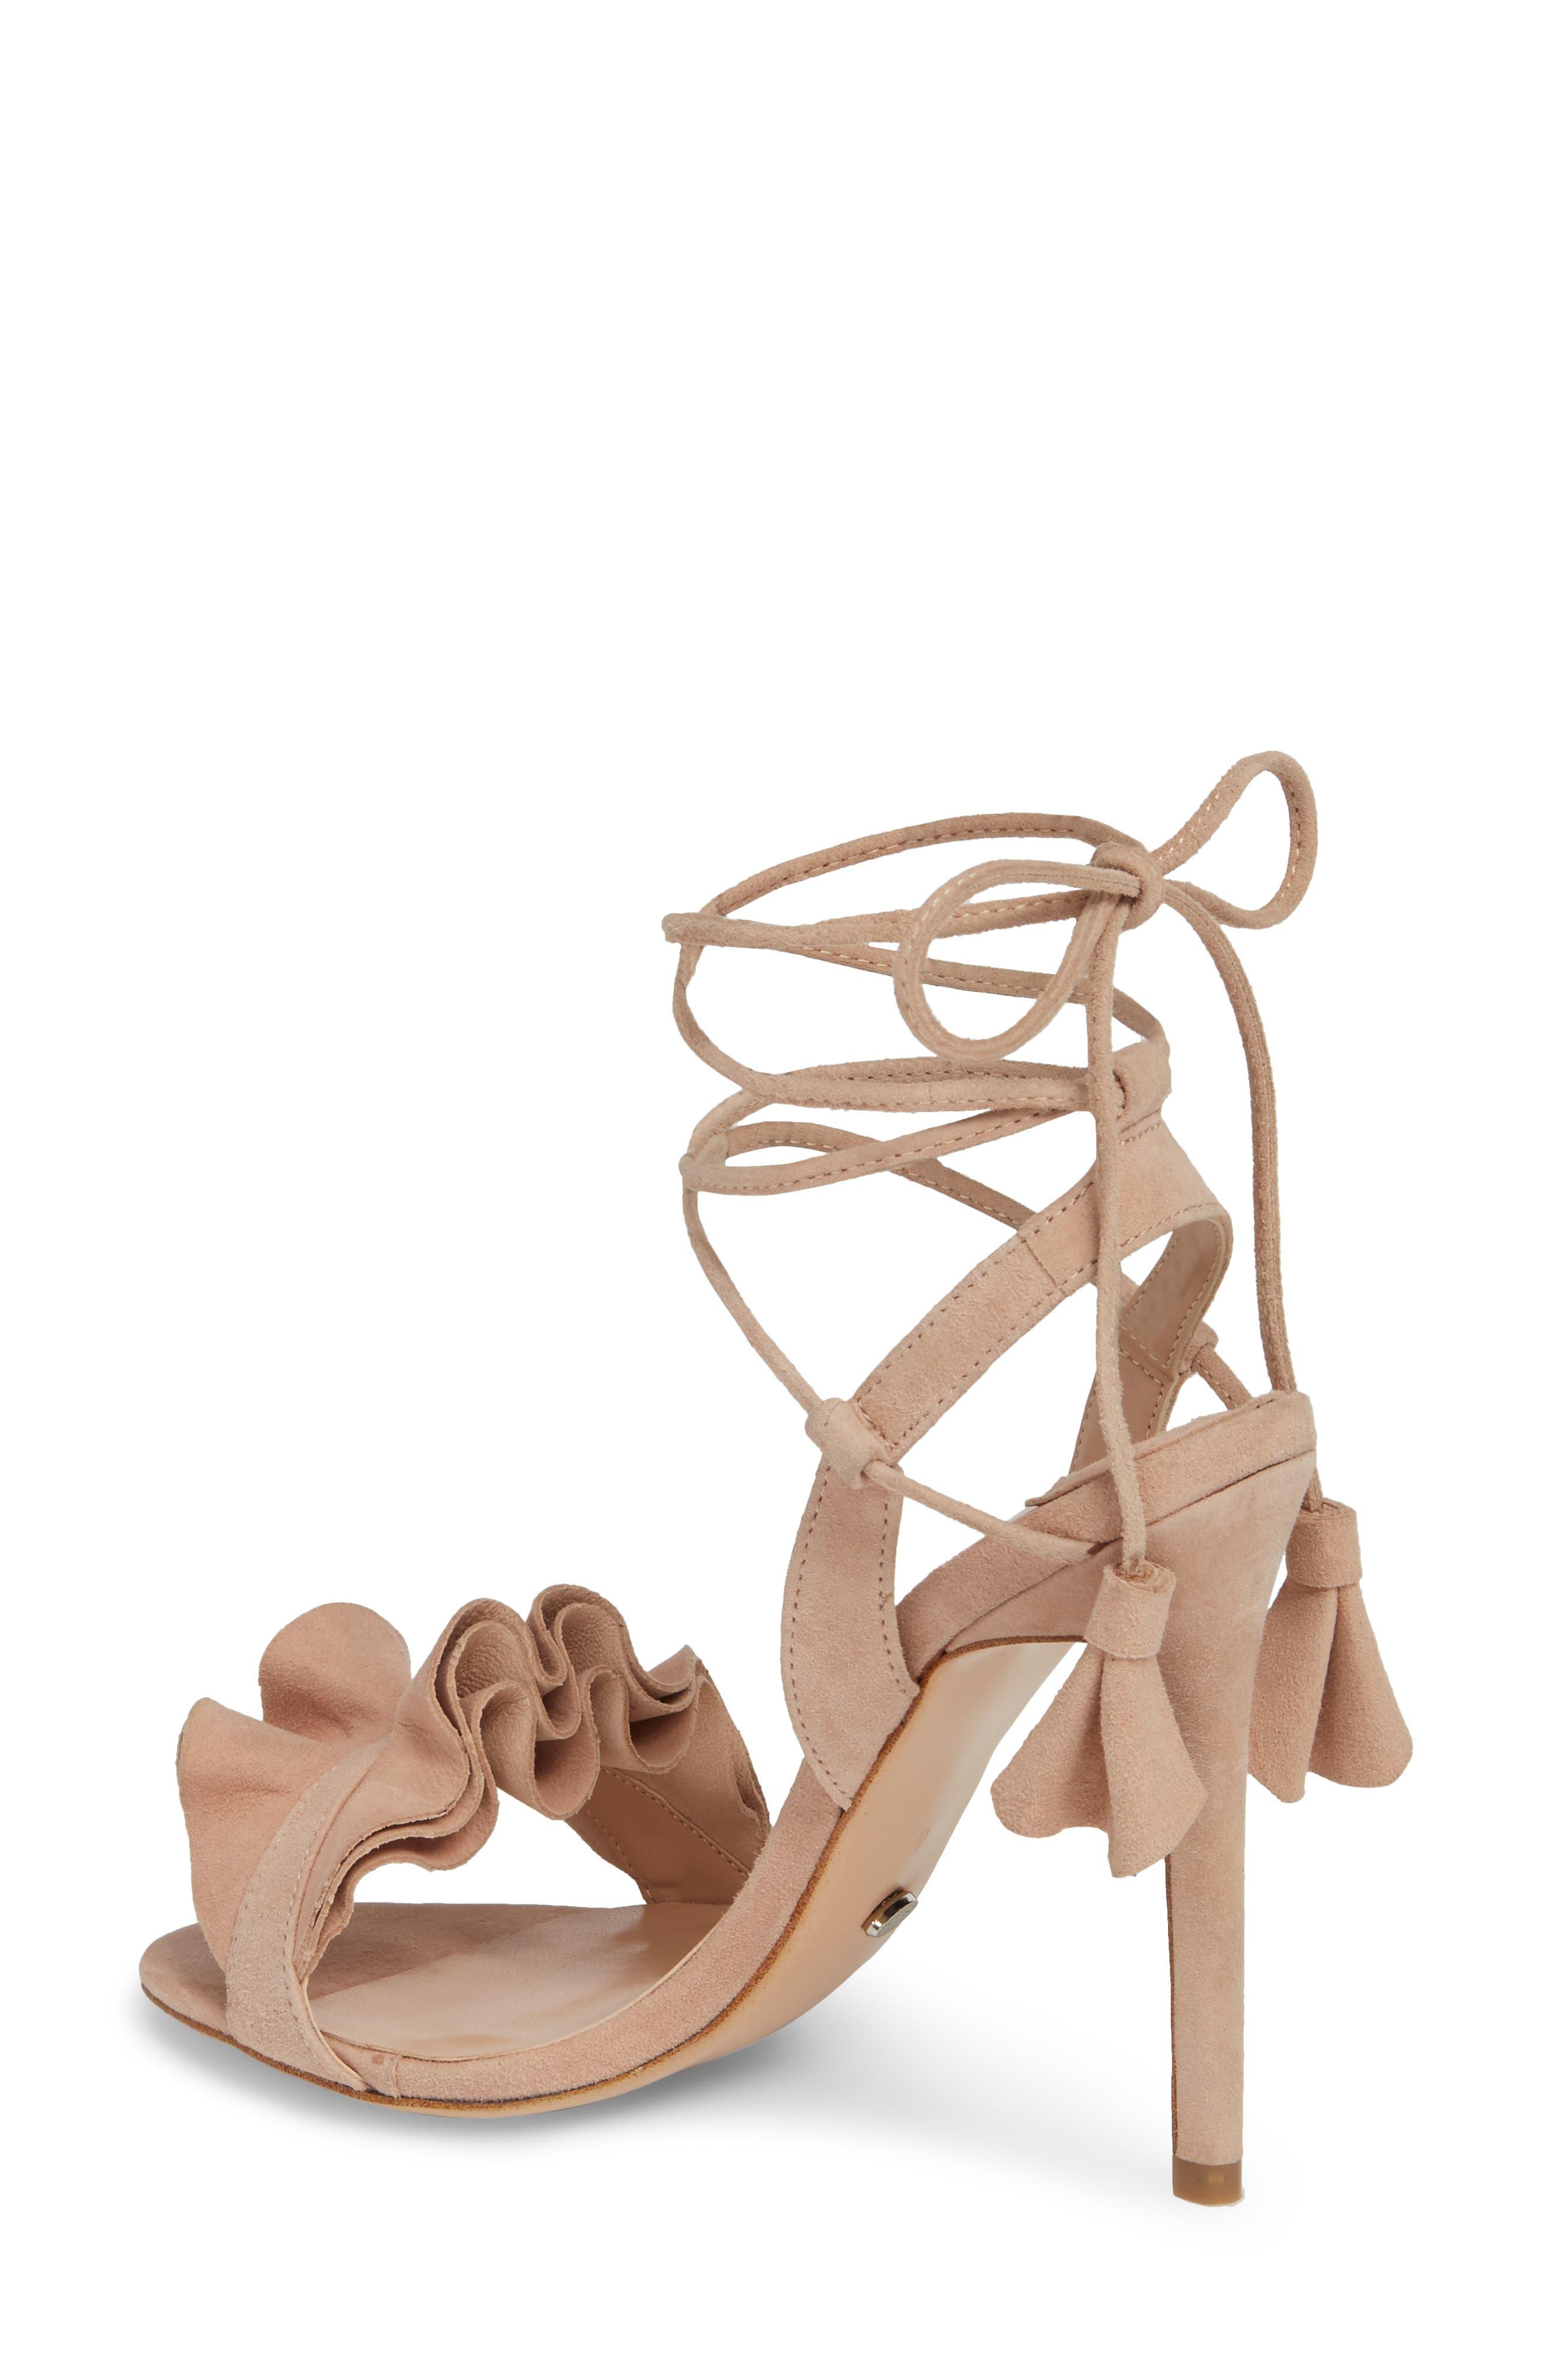 Kalipso Ruffled Wraparound Sandal,                             Alternate thumbnail 2, color,                             Blush Suede